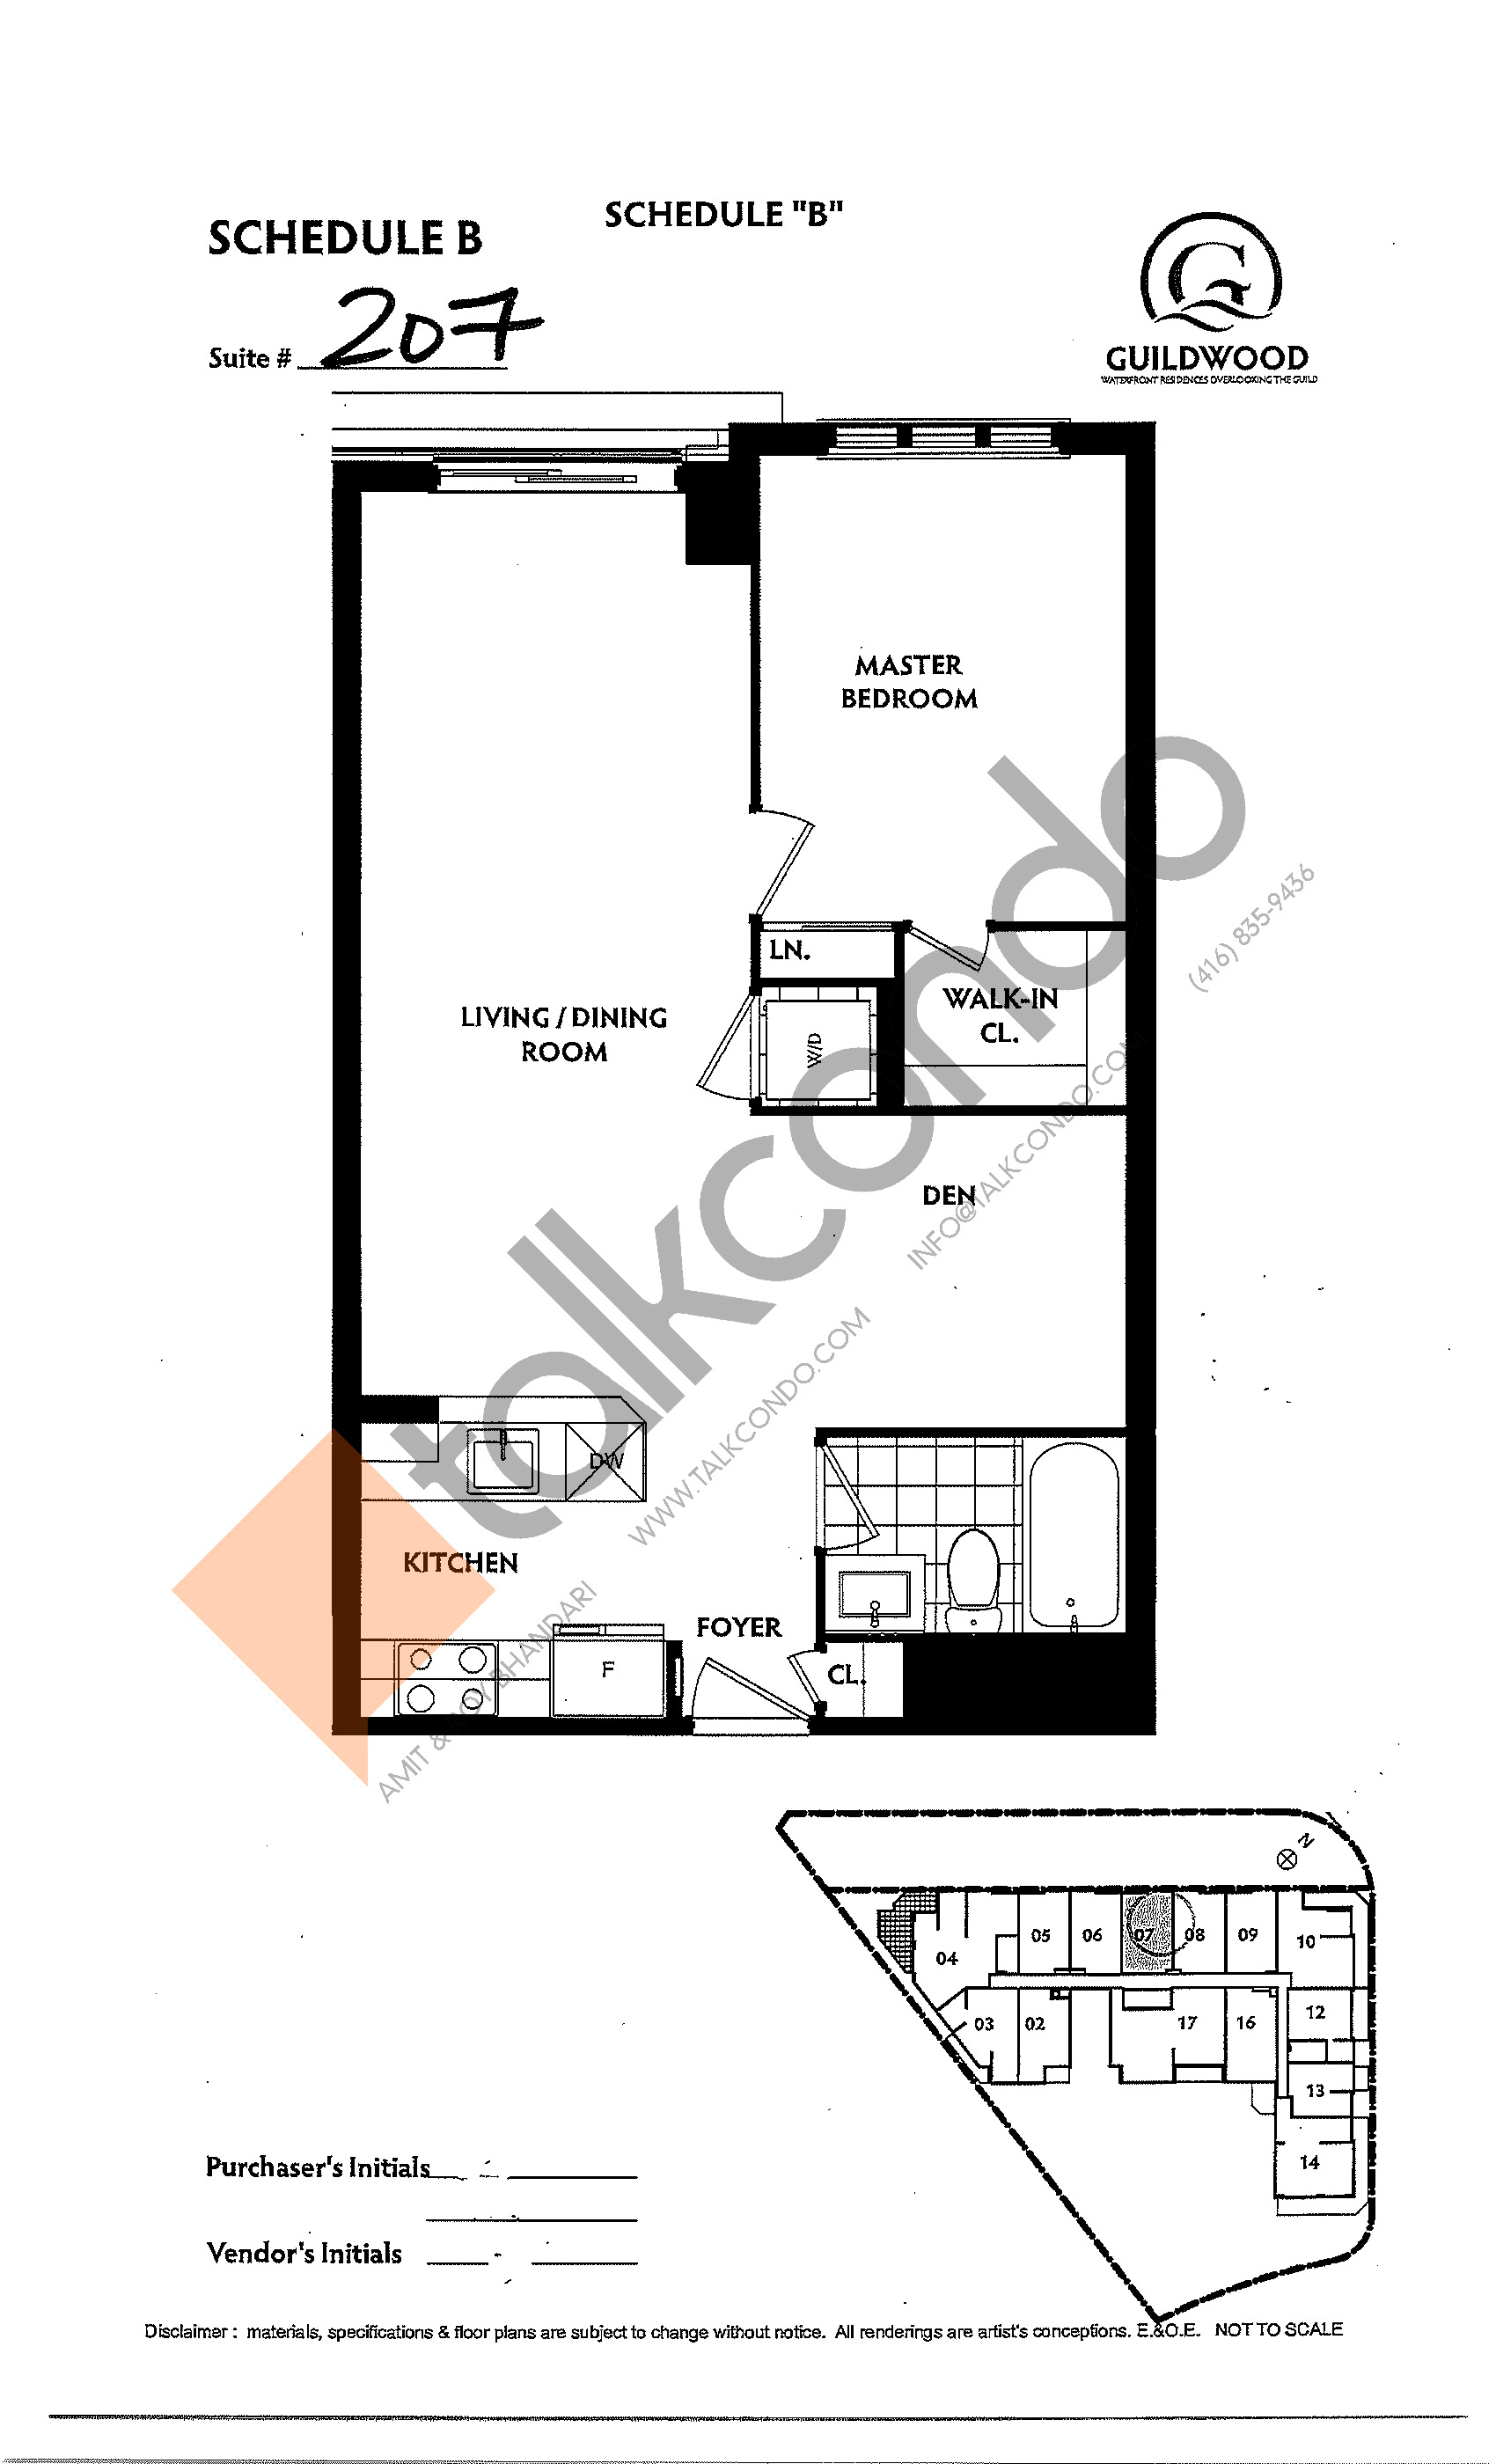 Suite 207 Floor Plan at Guildwood Condos - 668 sq.ft